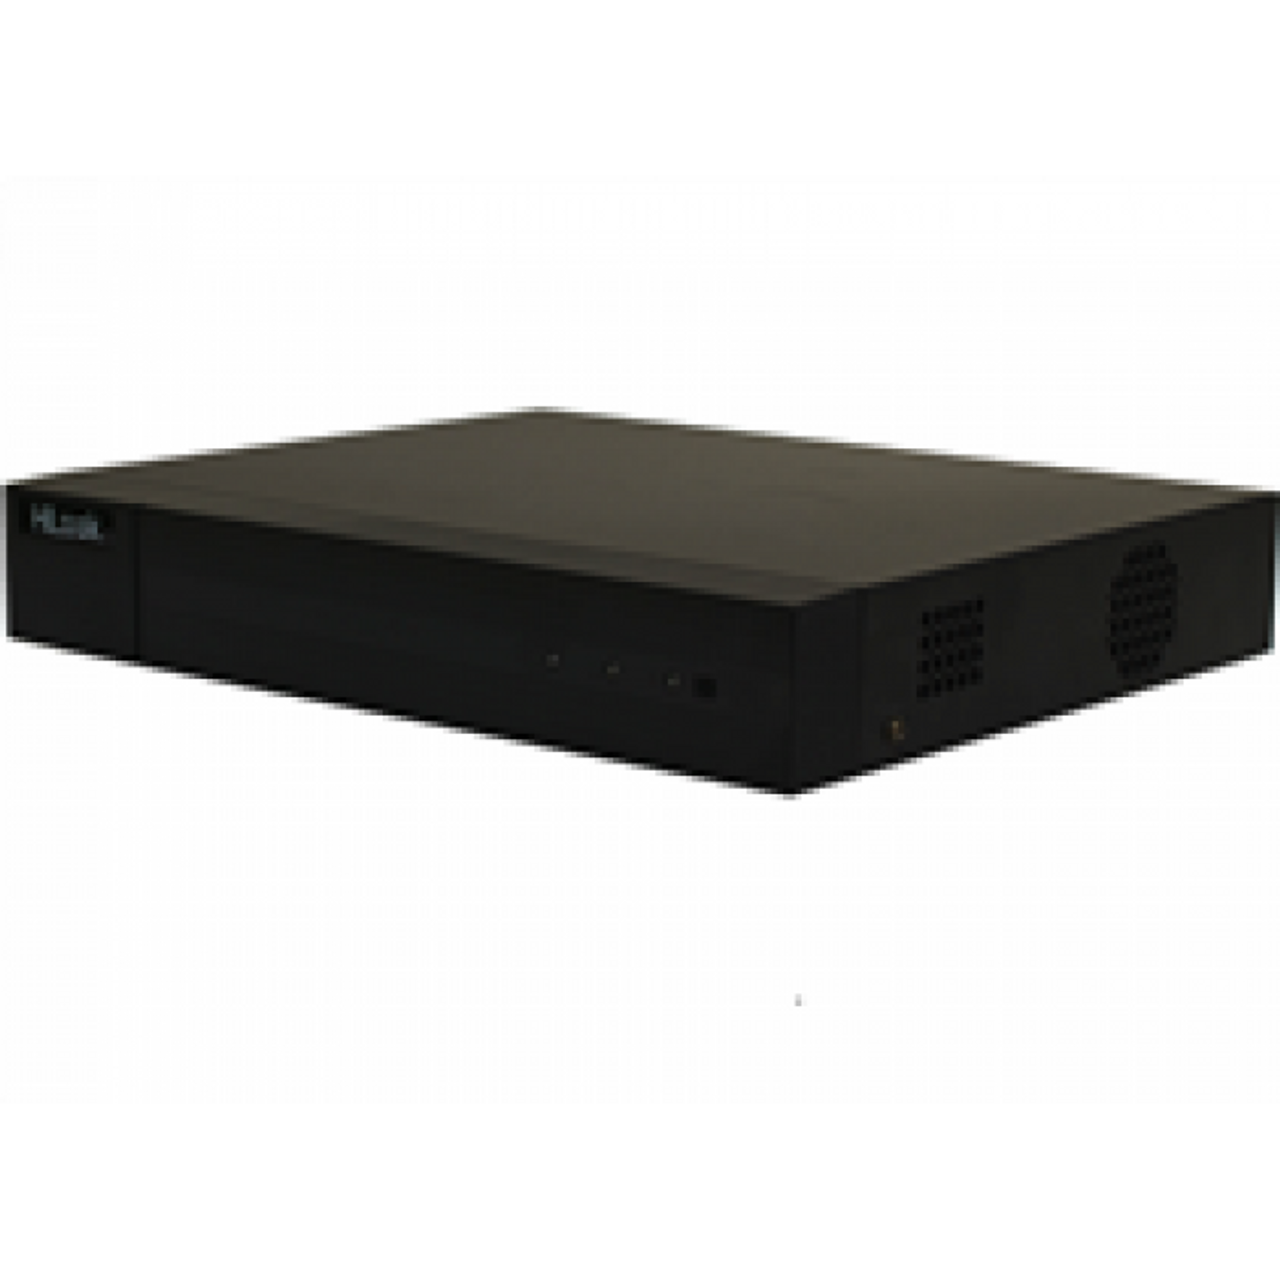 16-ch HD-TVI/AHD/CVI/CVBS video & 1-ch audio input, 2-ch IP video input(up to 18-ch IP), 1 SATA interface, HD1080p Lite @ 12 fps/ch, 260 1U case